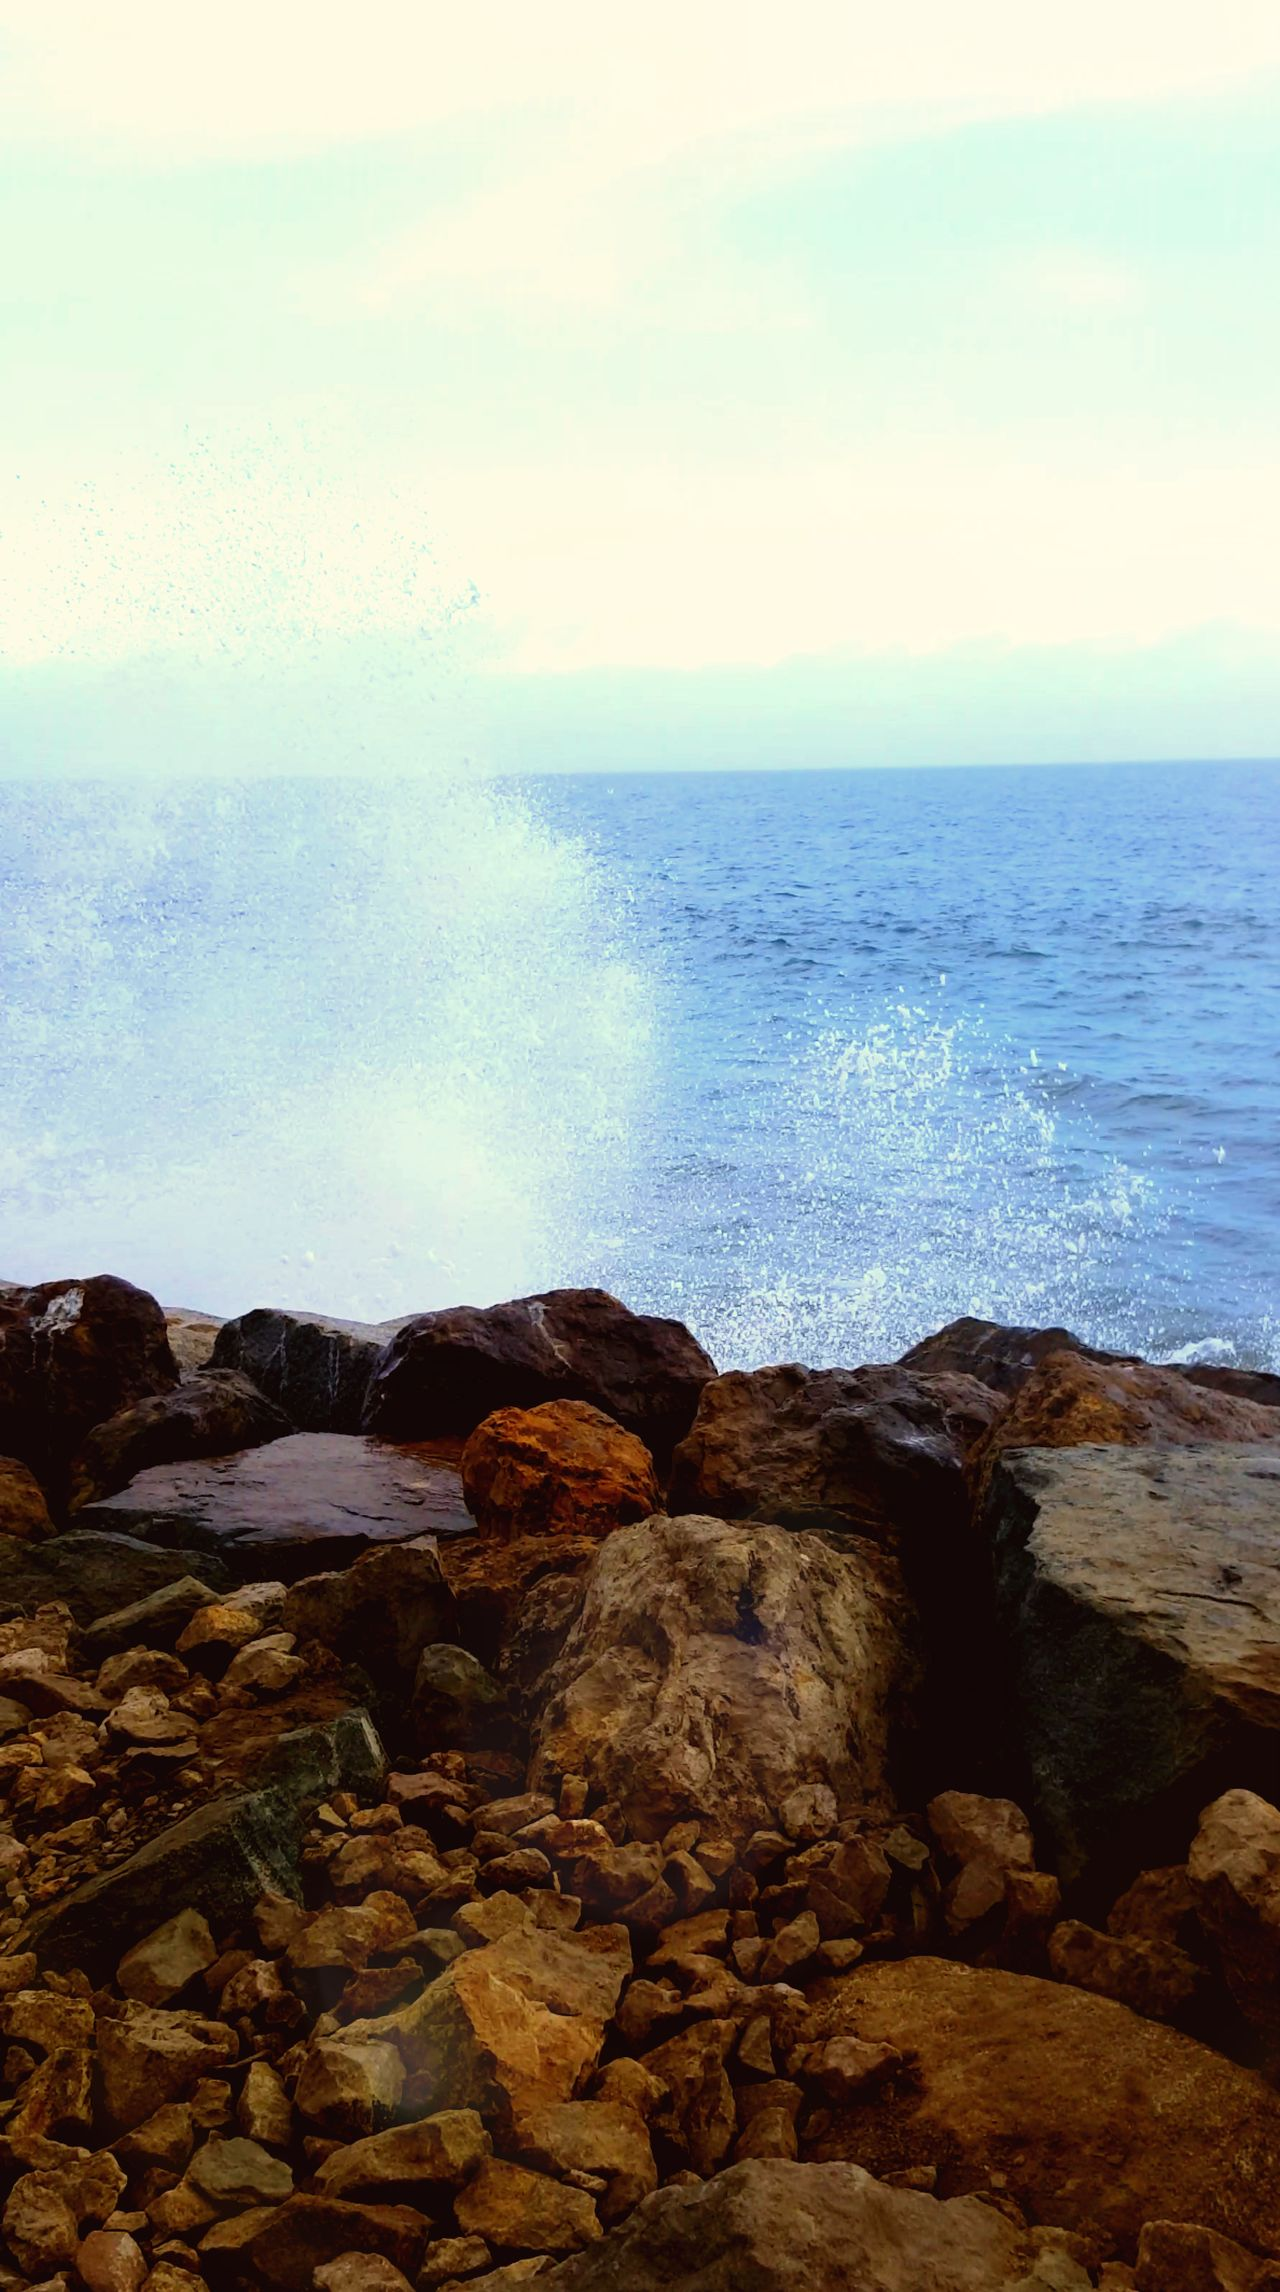 Ocean Wawes Rocks Santa Monica Santa Monica Beach Pasificocean Blu Oceans Splashing California